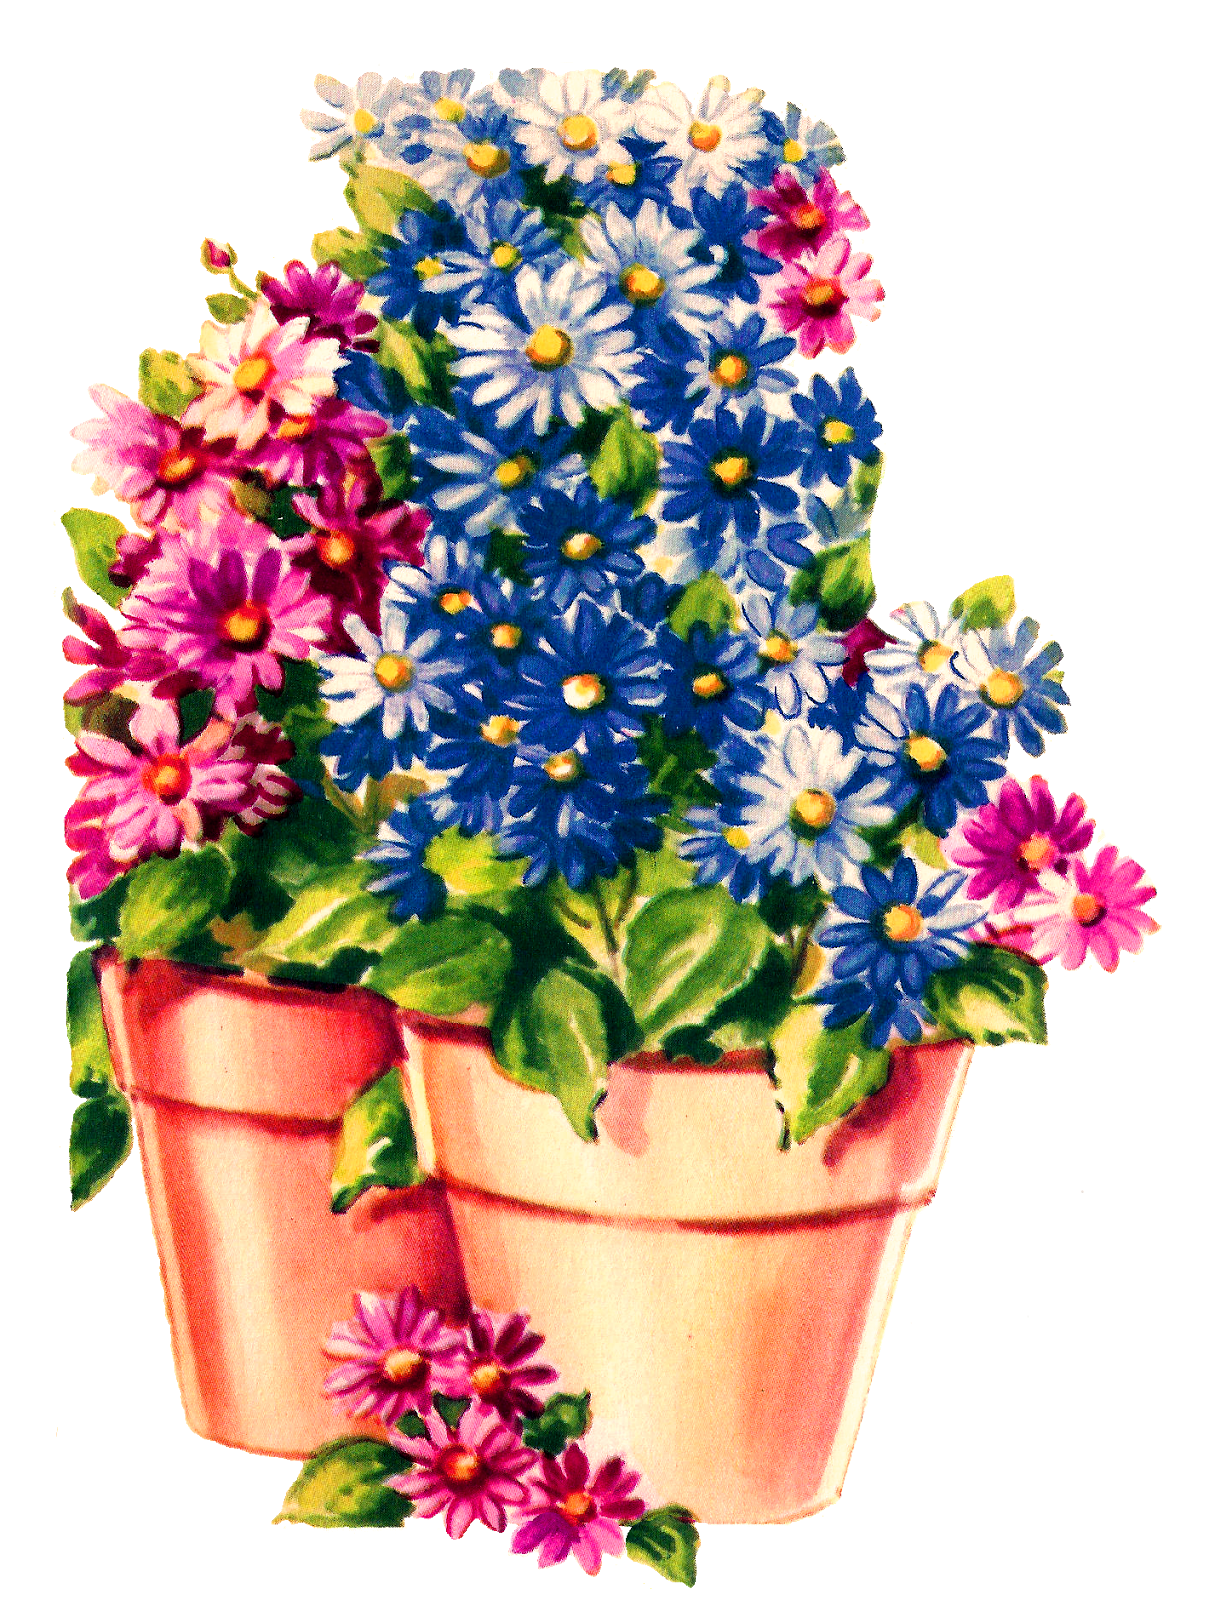 Antique images flower pot. Daisy clipart wildflower